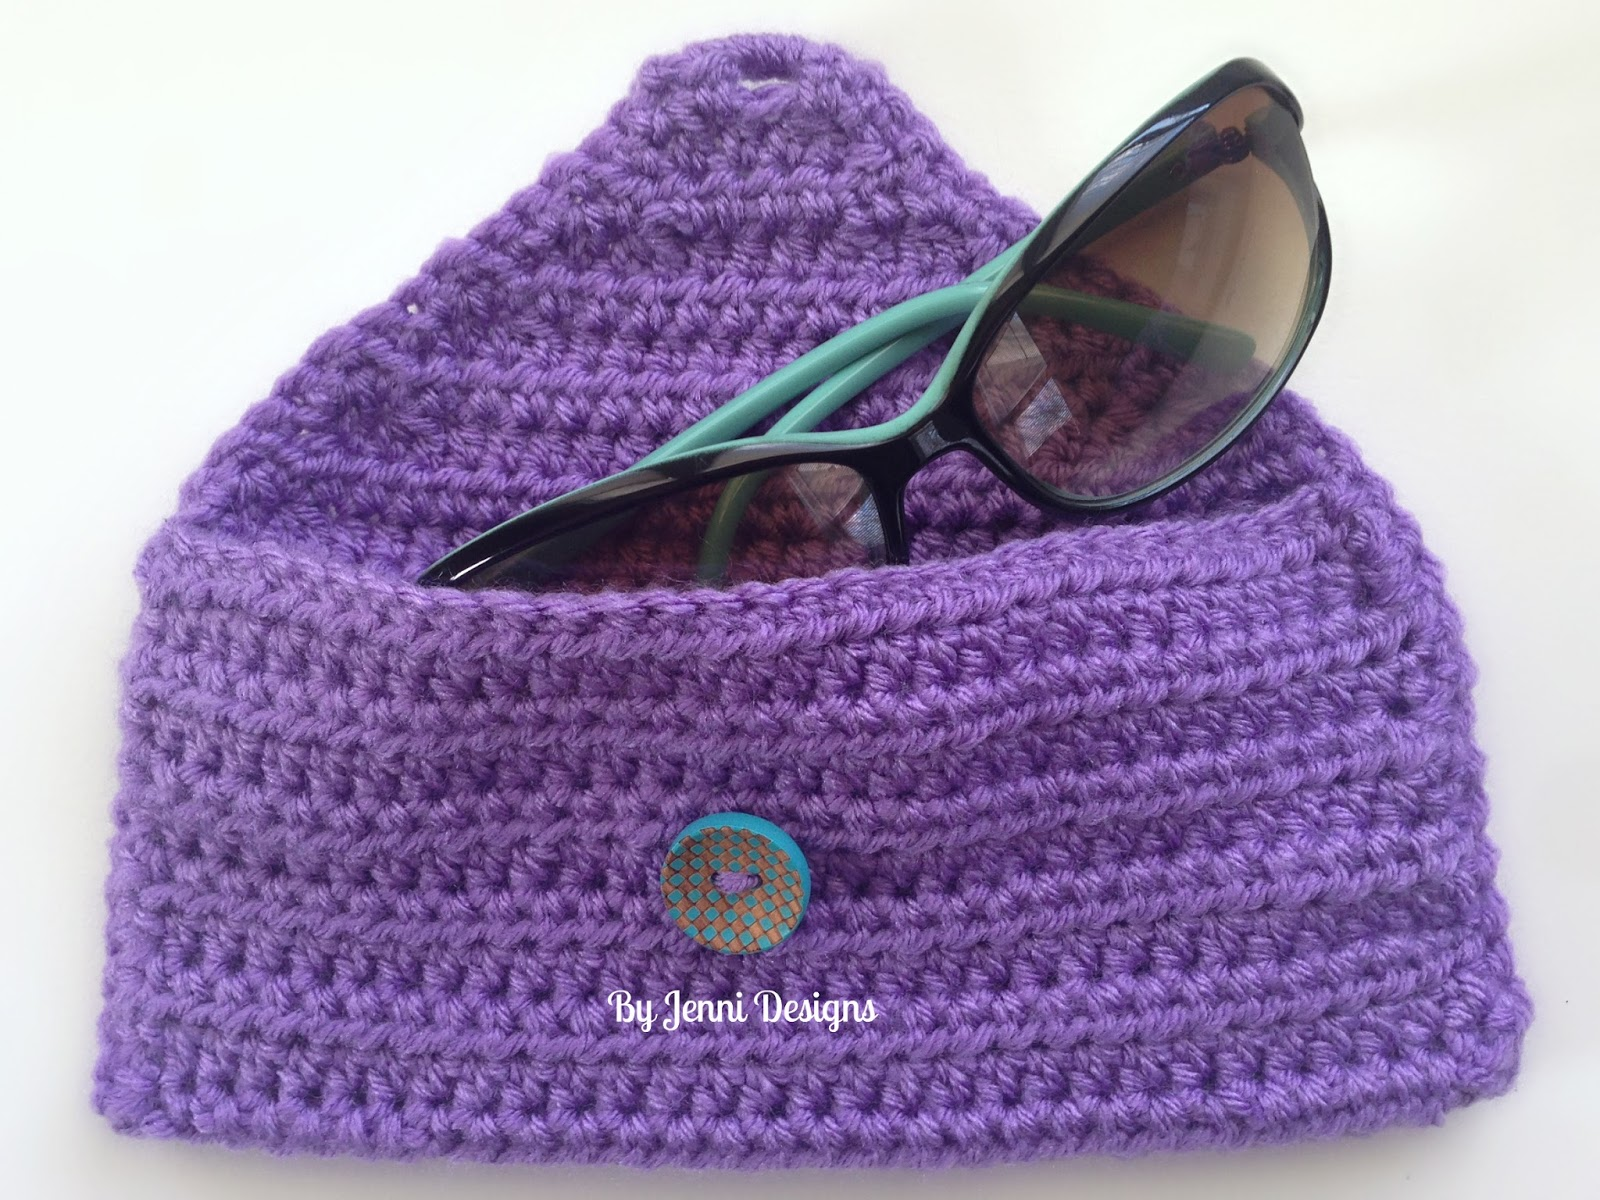 By Jenni Designs: Free Crochet Pattern: Easy Sunglass Pouch